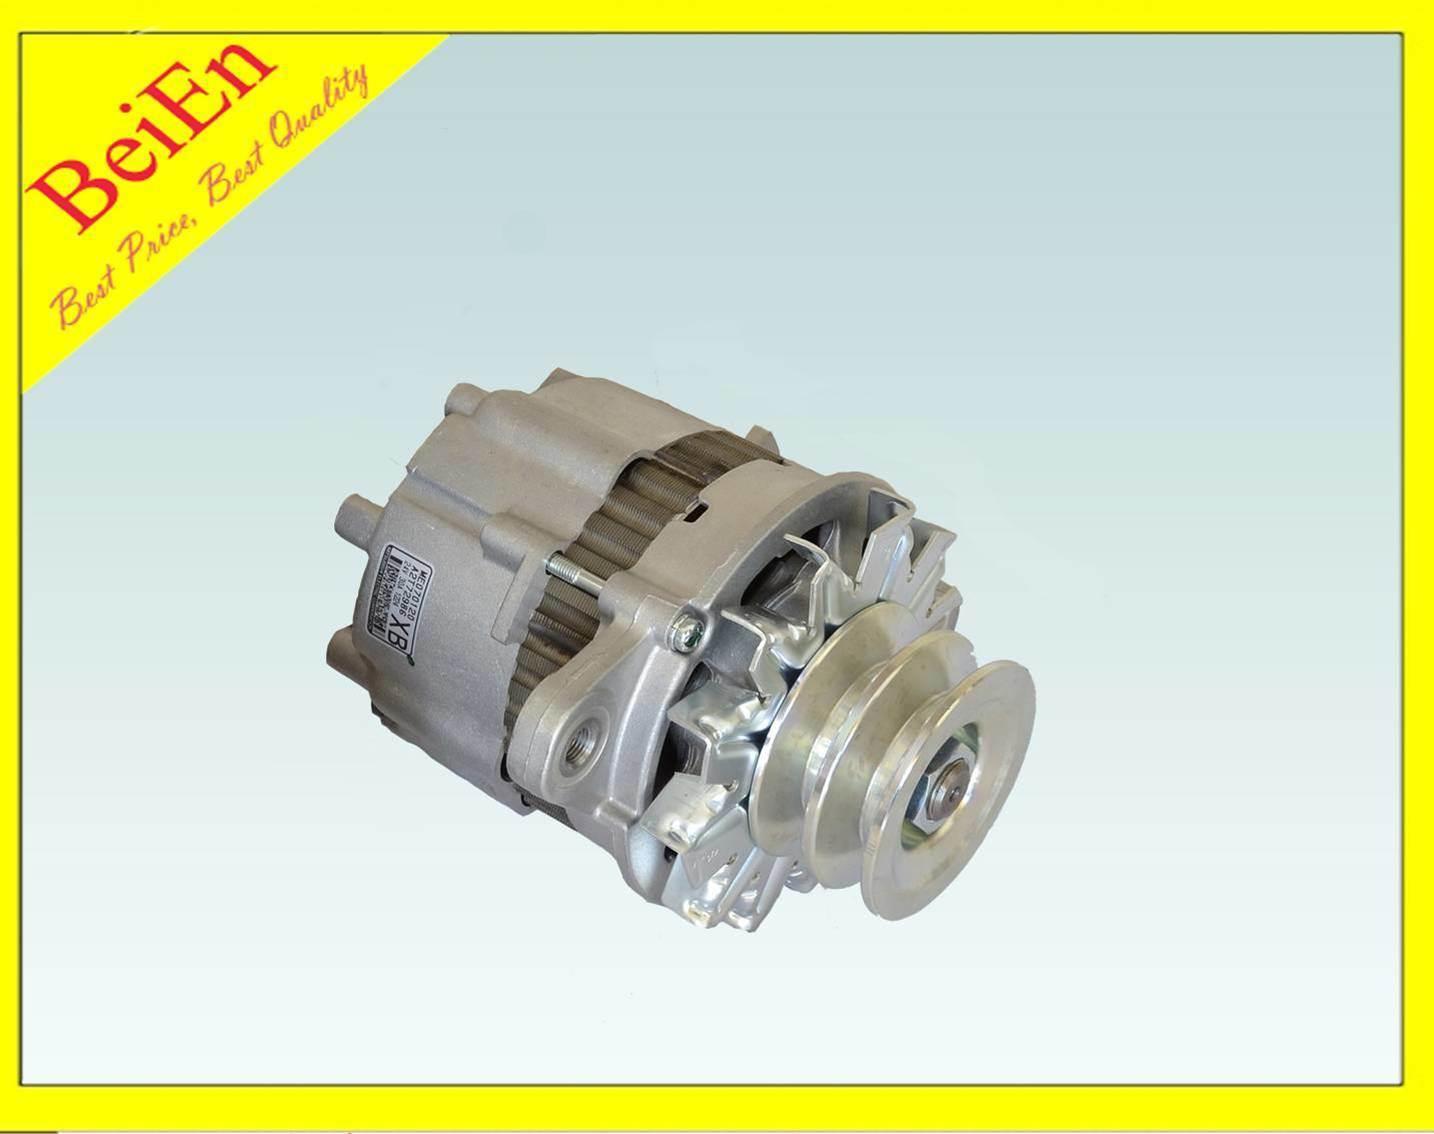 E320 Generator for Mitsubishi Excavator Engine Me070120-30A